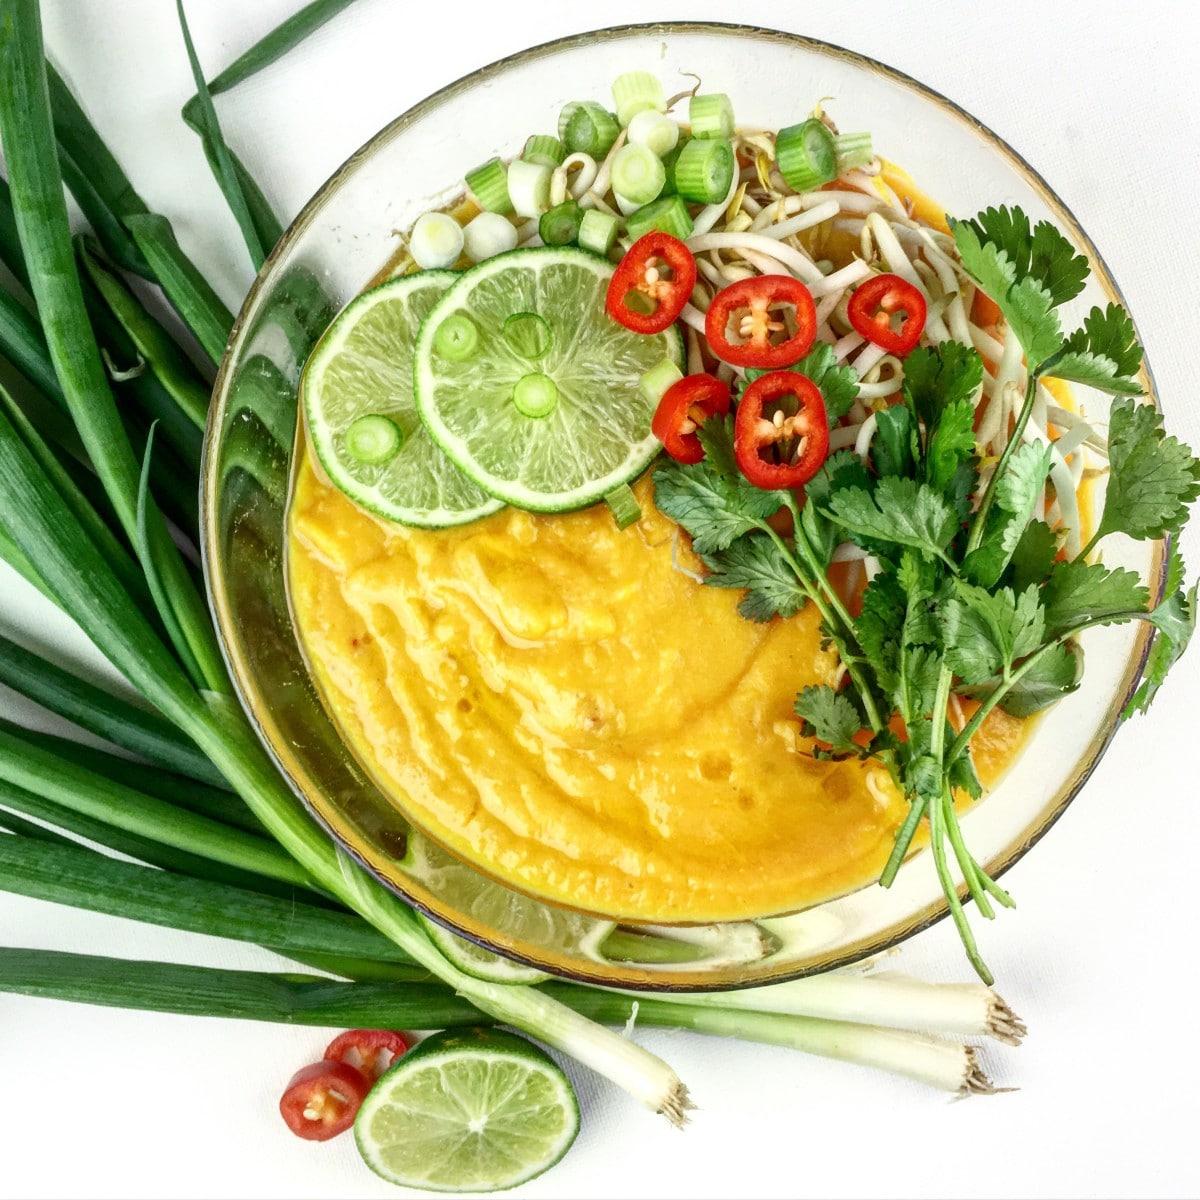 Thaise zoete aardappelsoep